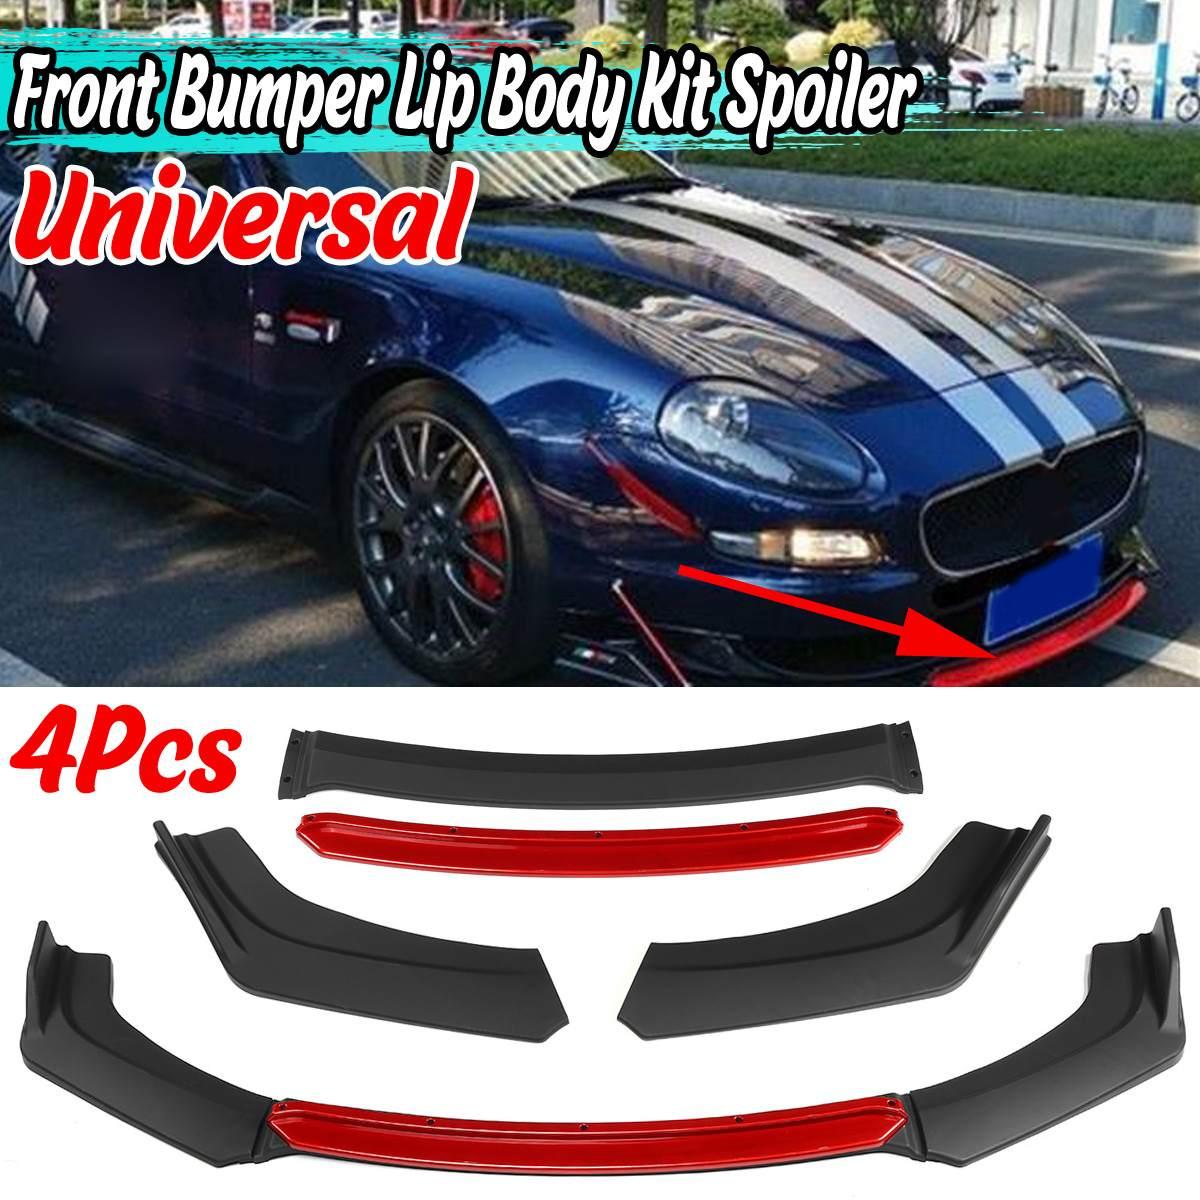 4Pcs Universal Car Front Bumper Splitter Lip Body Kit Spoiler Diffuser For Honda For Civic For BMW For Benz For Audi For Toyota